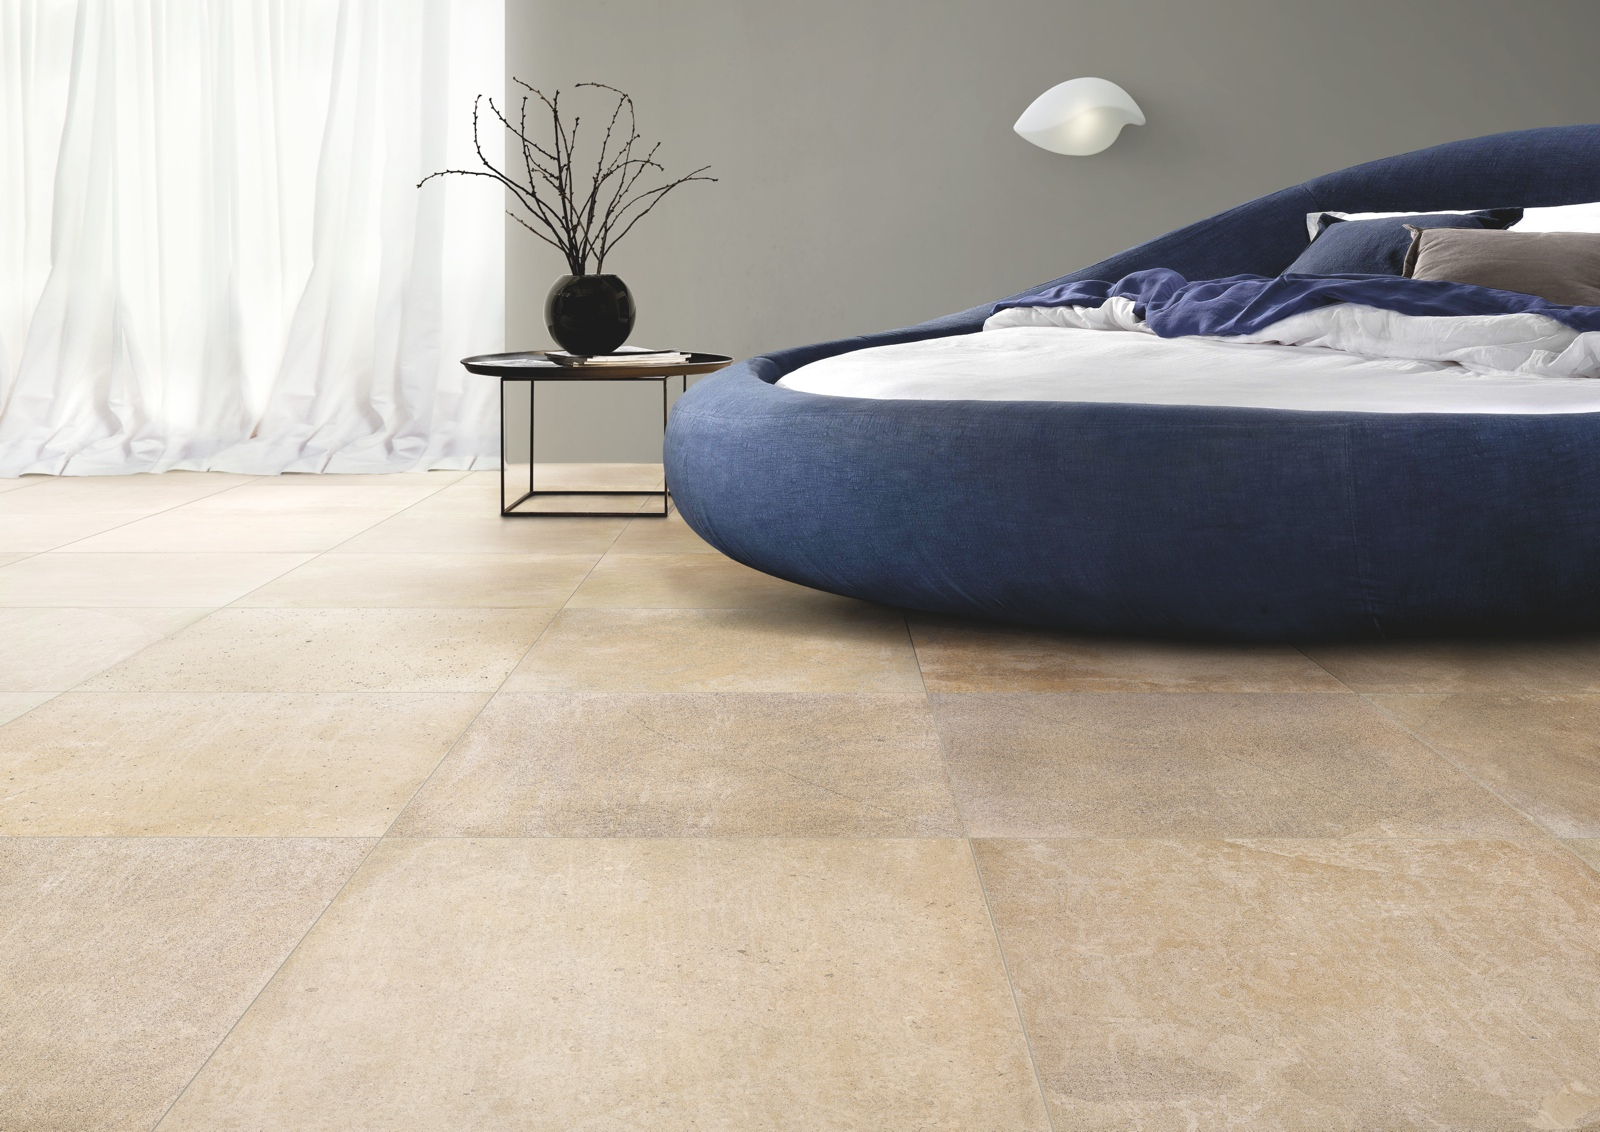 Pietra baug pavimento by casalgrande padana for Gres porcellanato carrelage